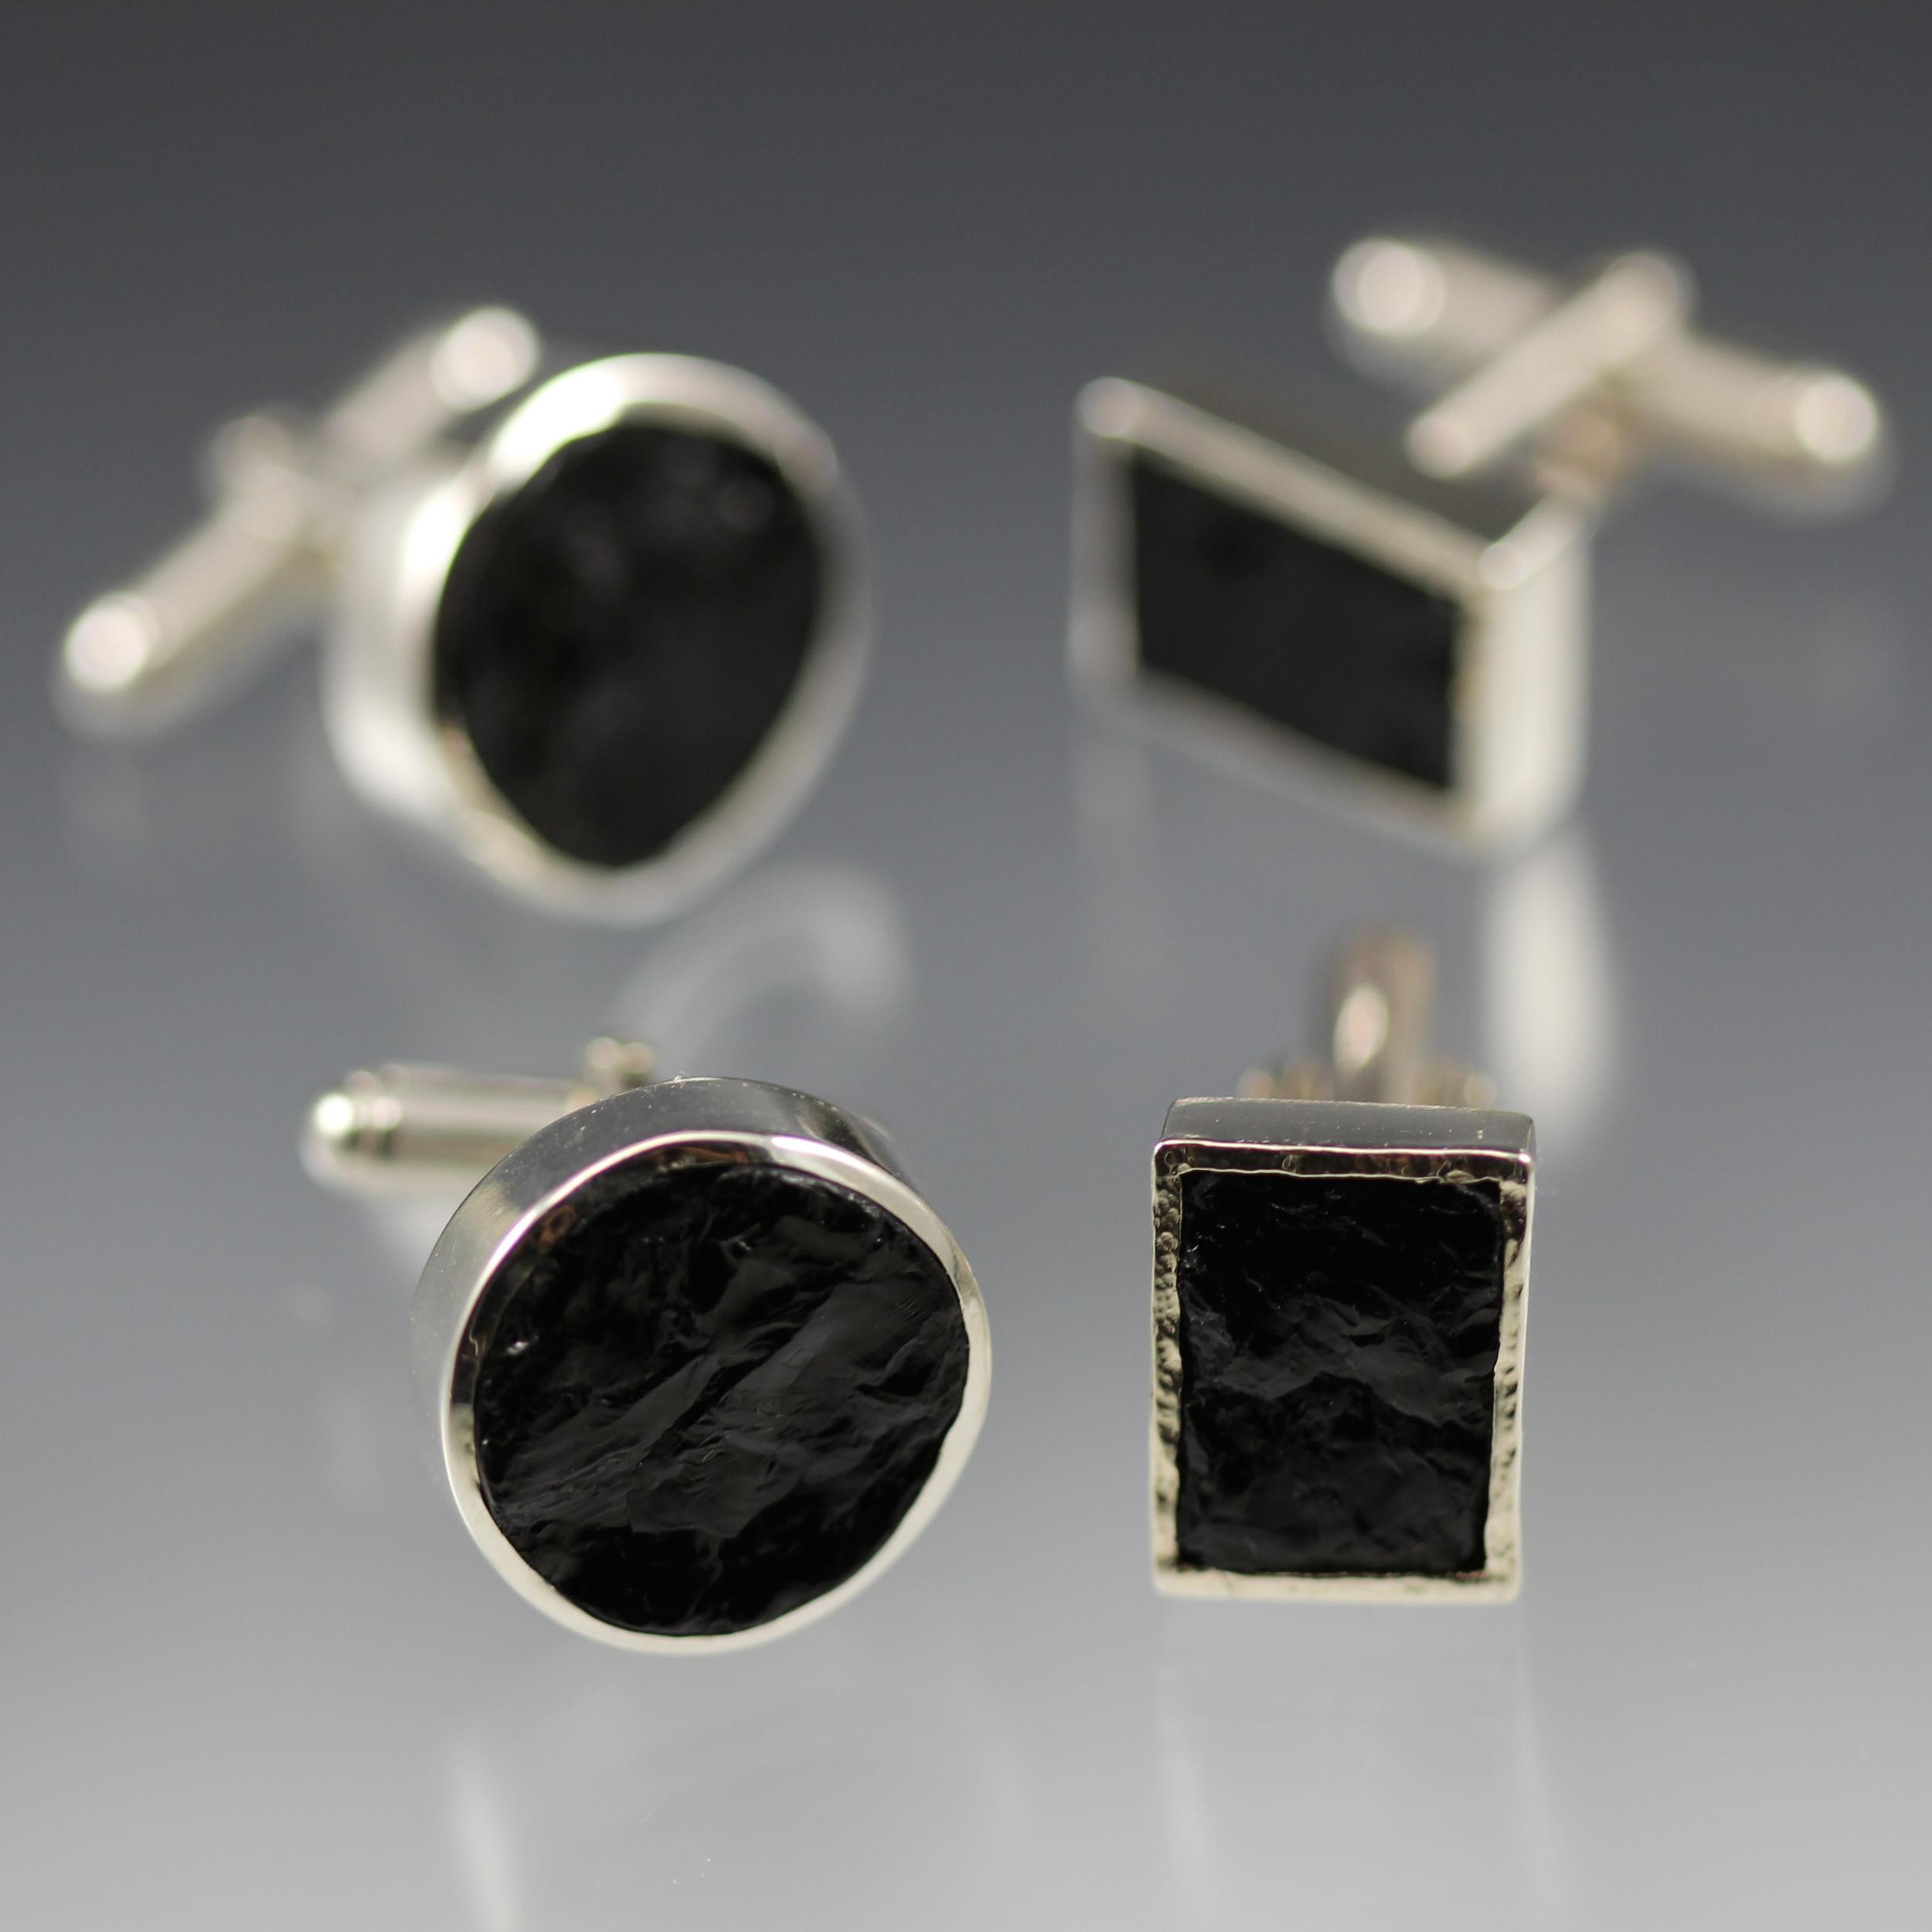 Black Tourmaline Cufflinks